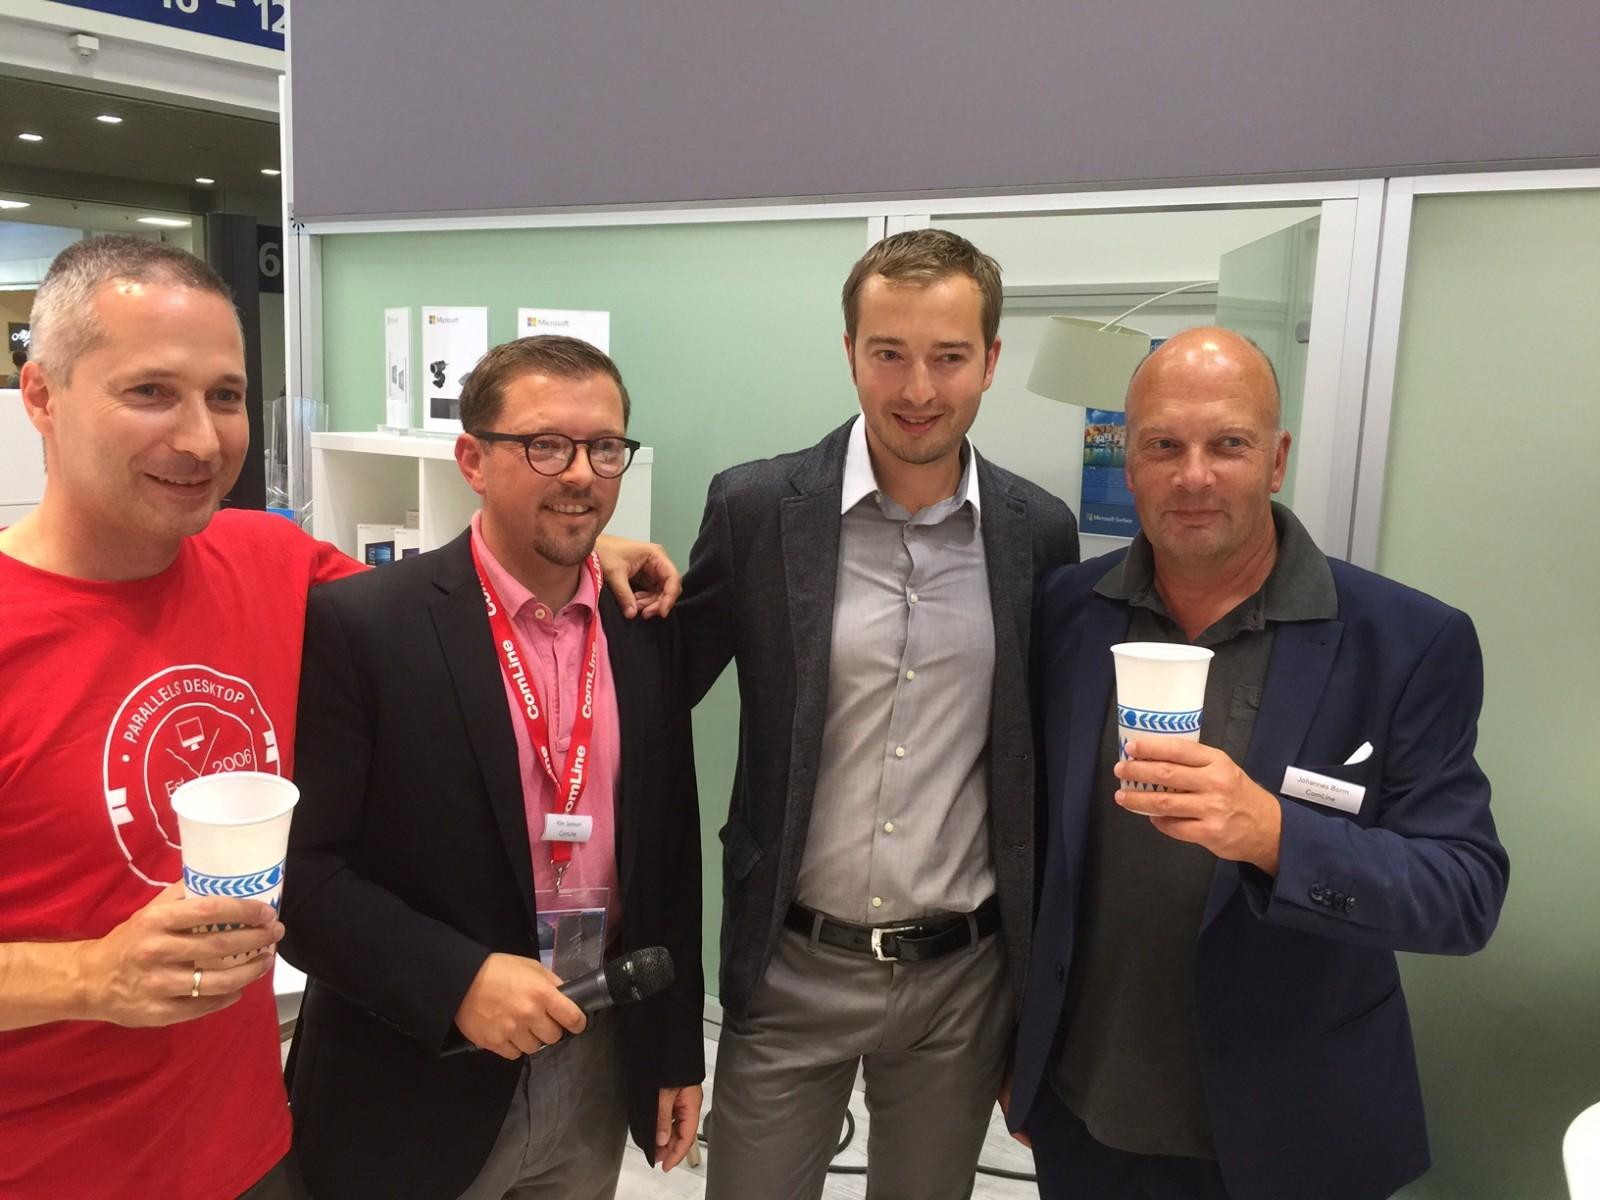 Roland Franze (Parallels), Kim Jannsen (ComLine), Rafael Frankow (Smanos) und Johannes Borm (ComLine) v.l.n.r.